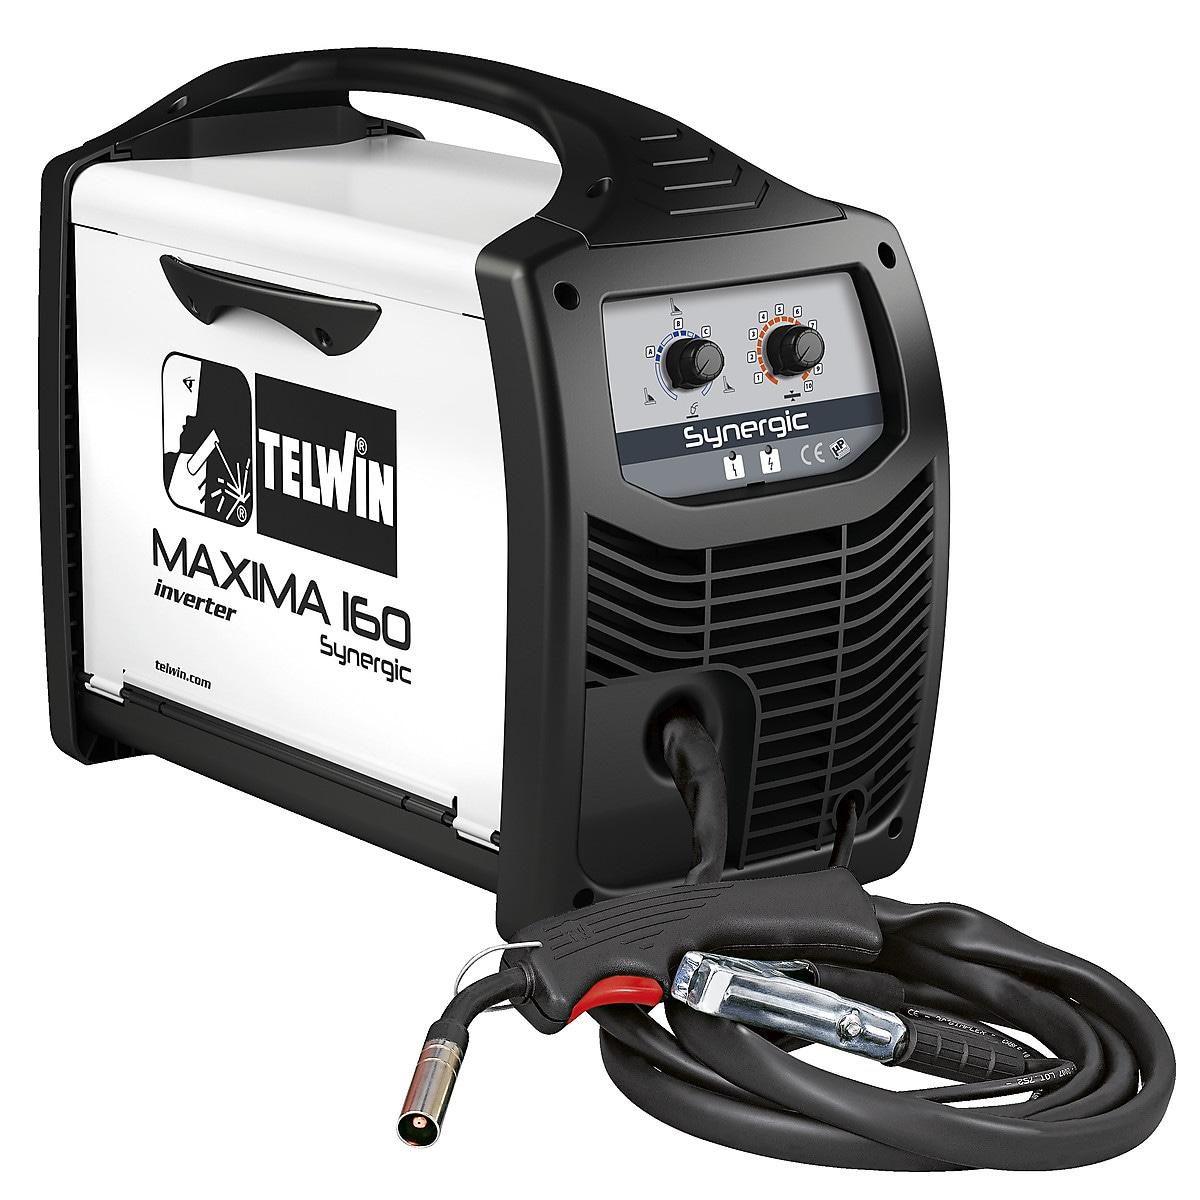 Svets Telwin MAXIMA 160 Synergic